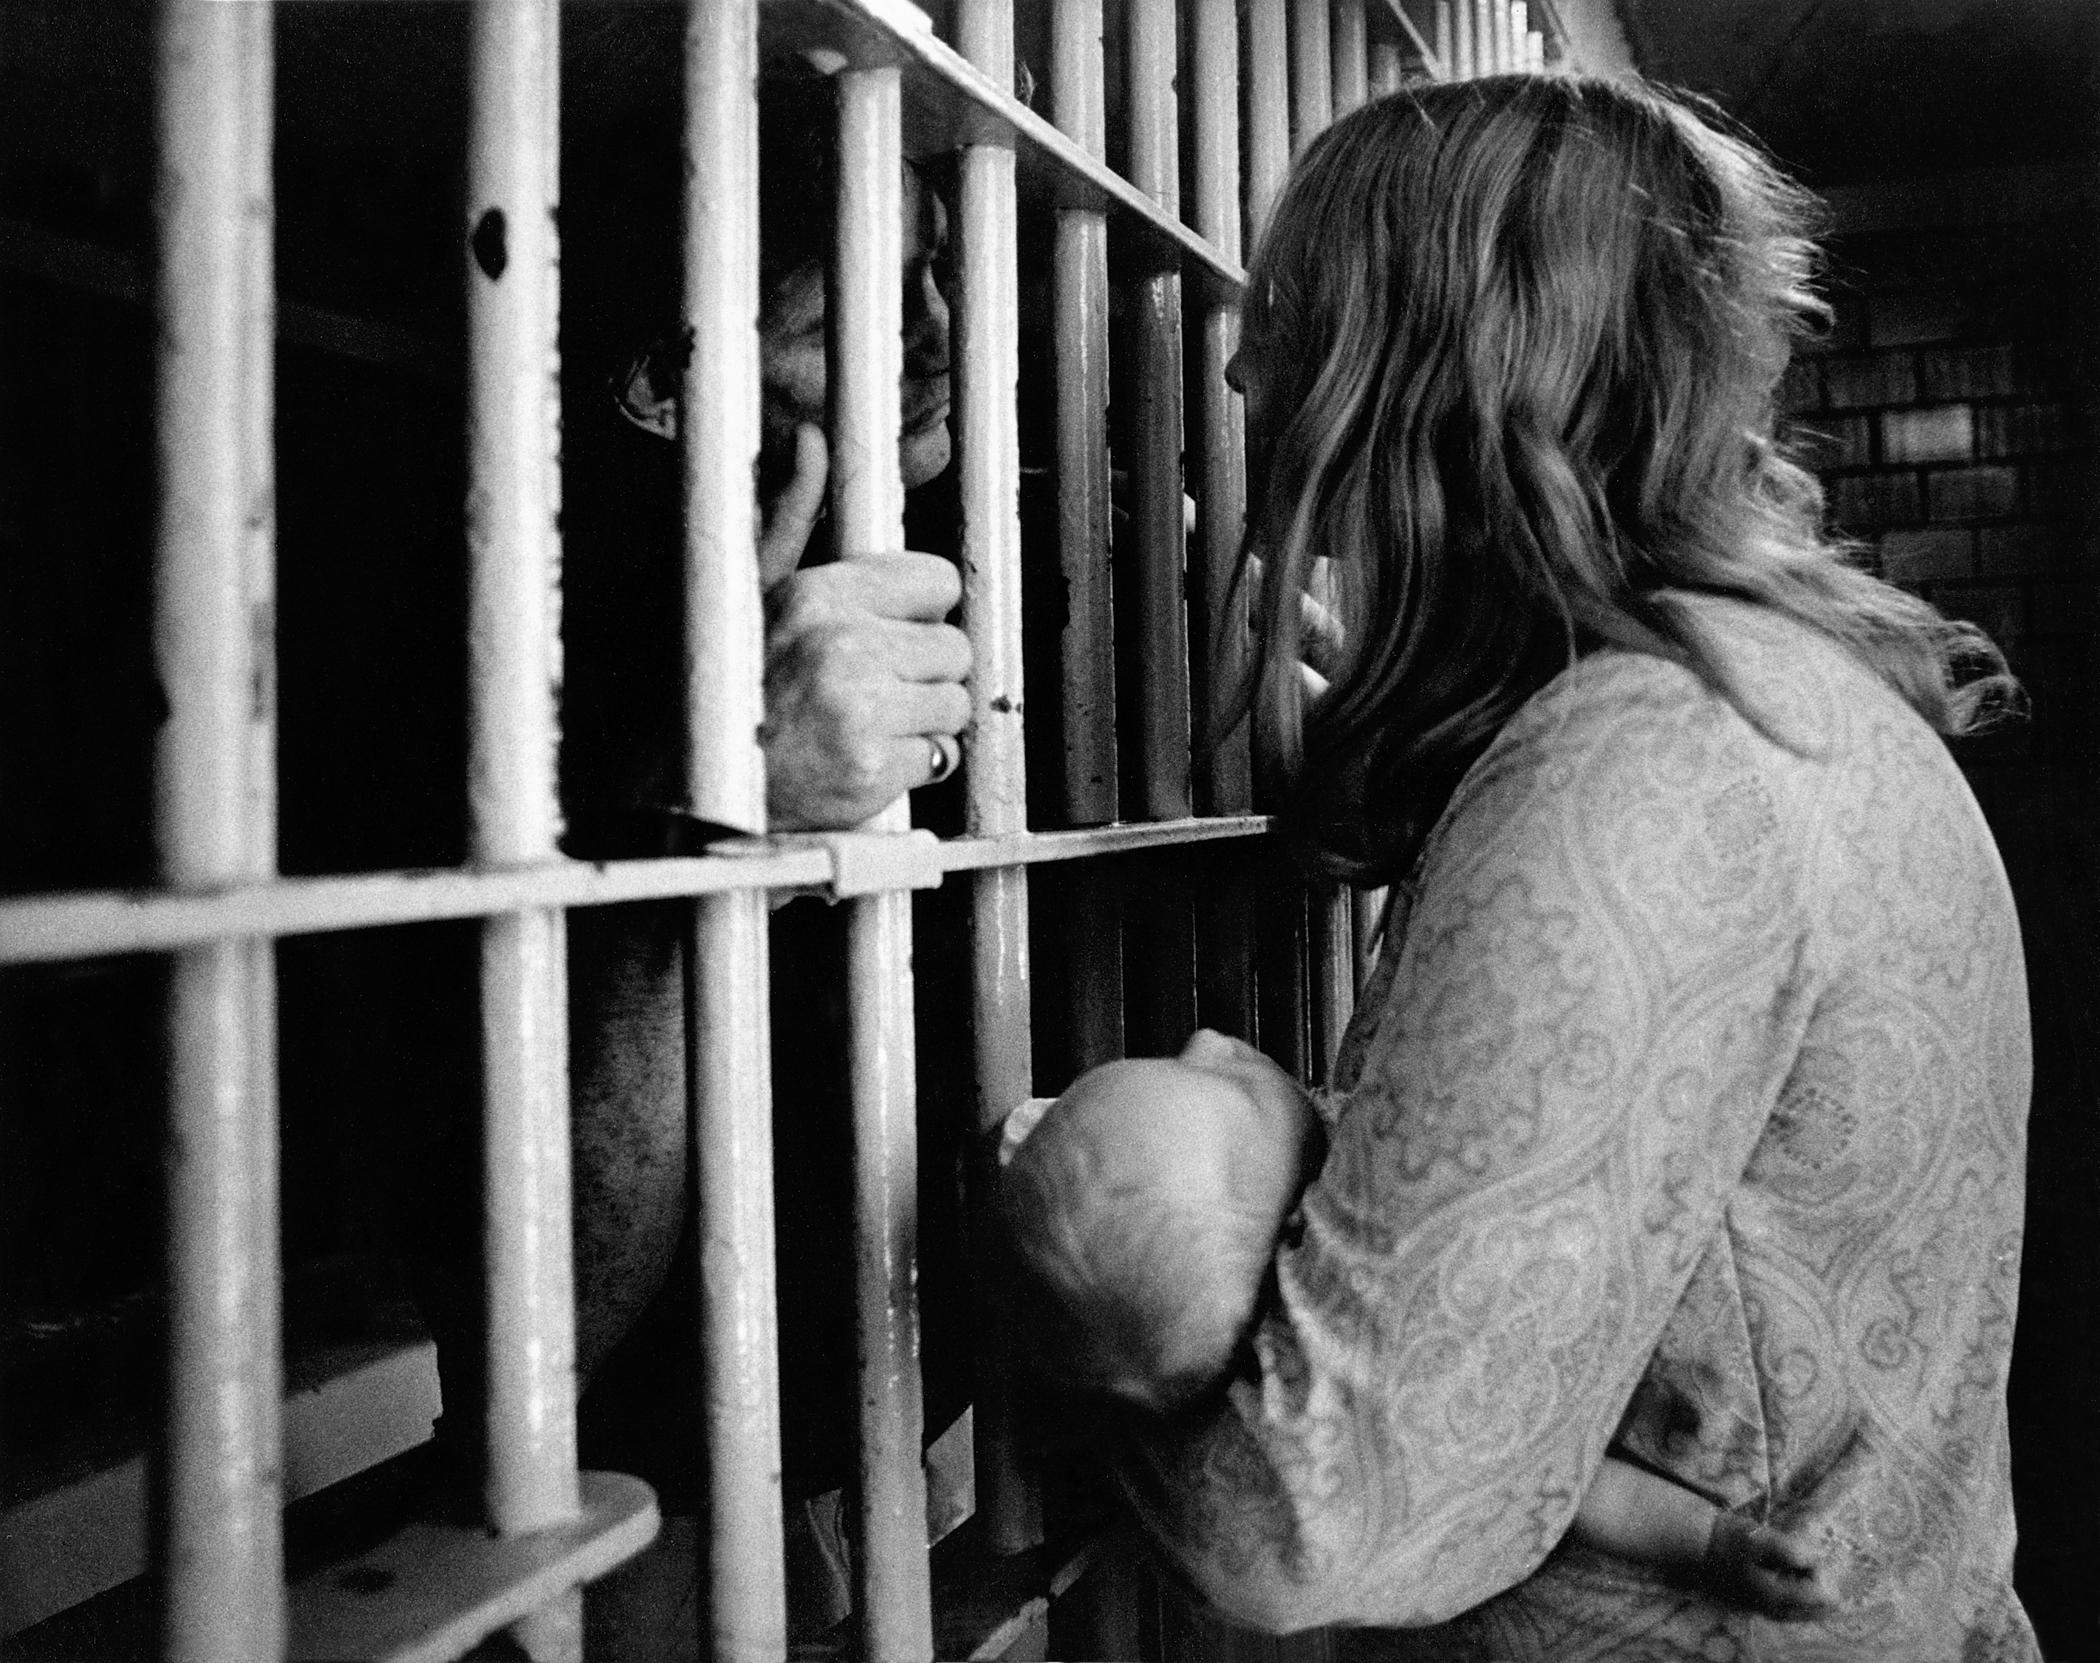 Baby in Jail.jpg